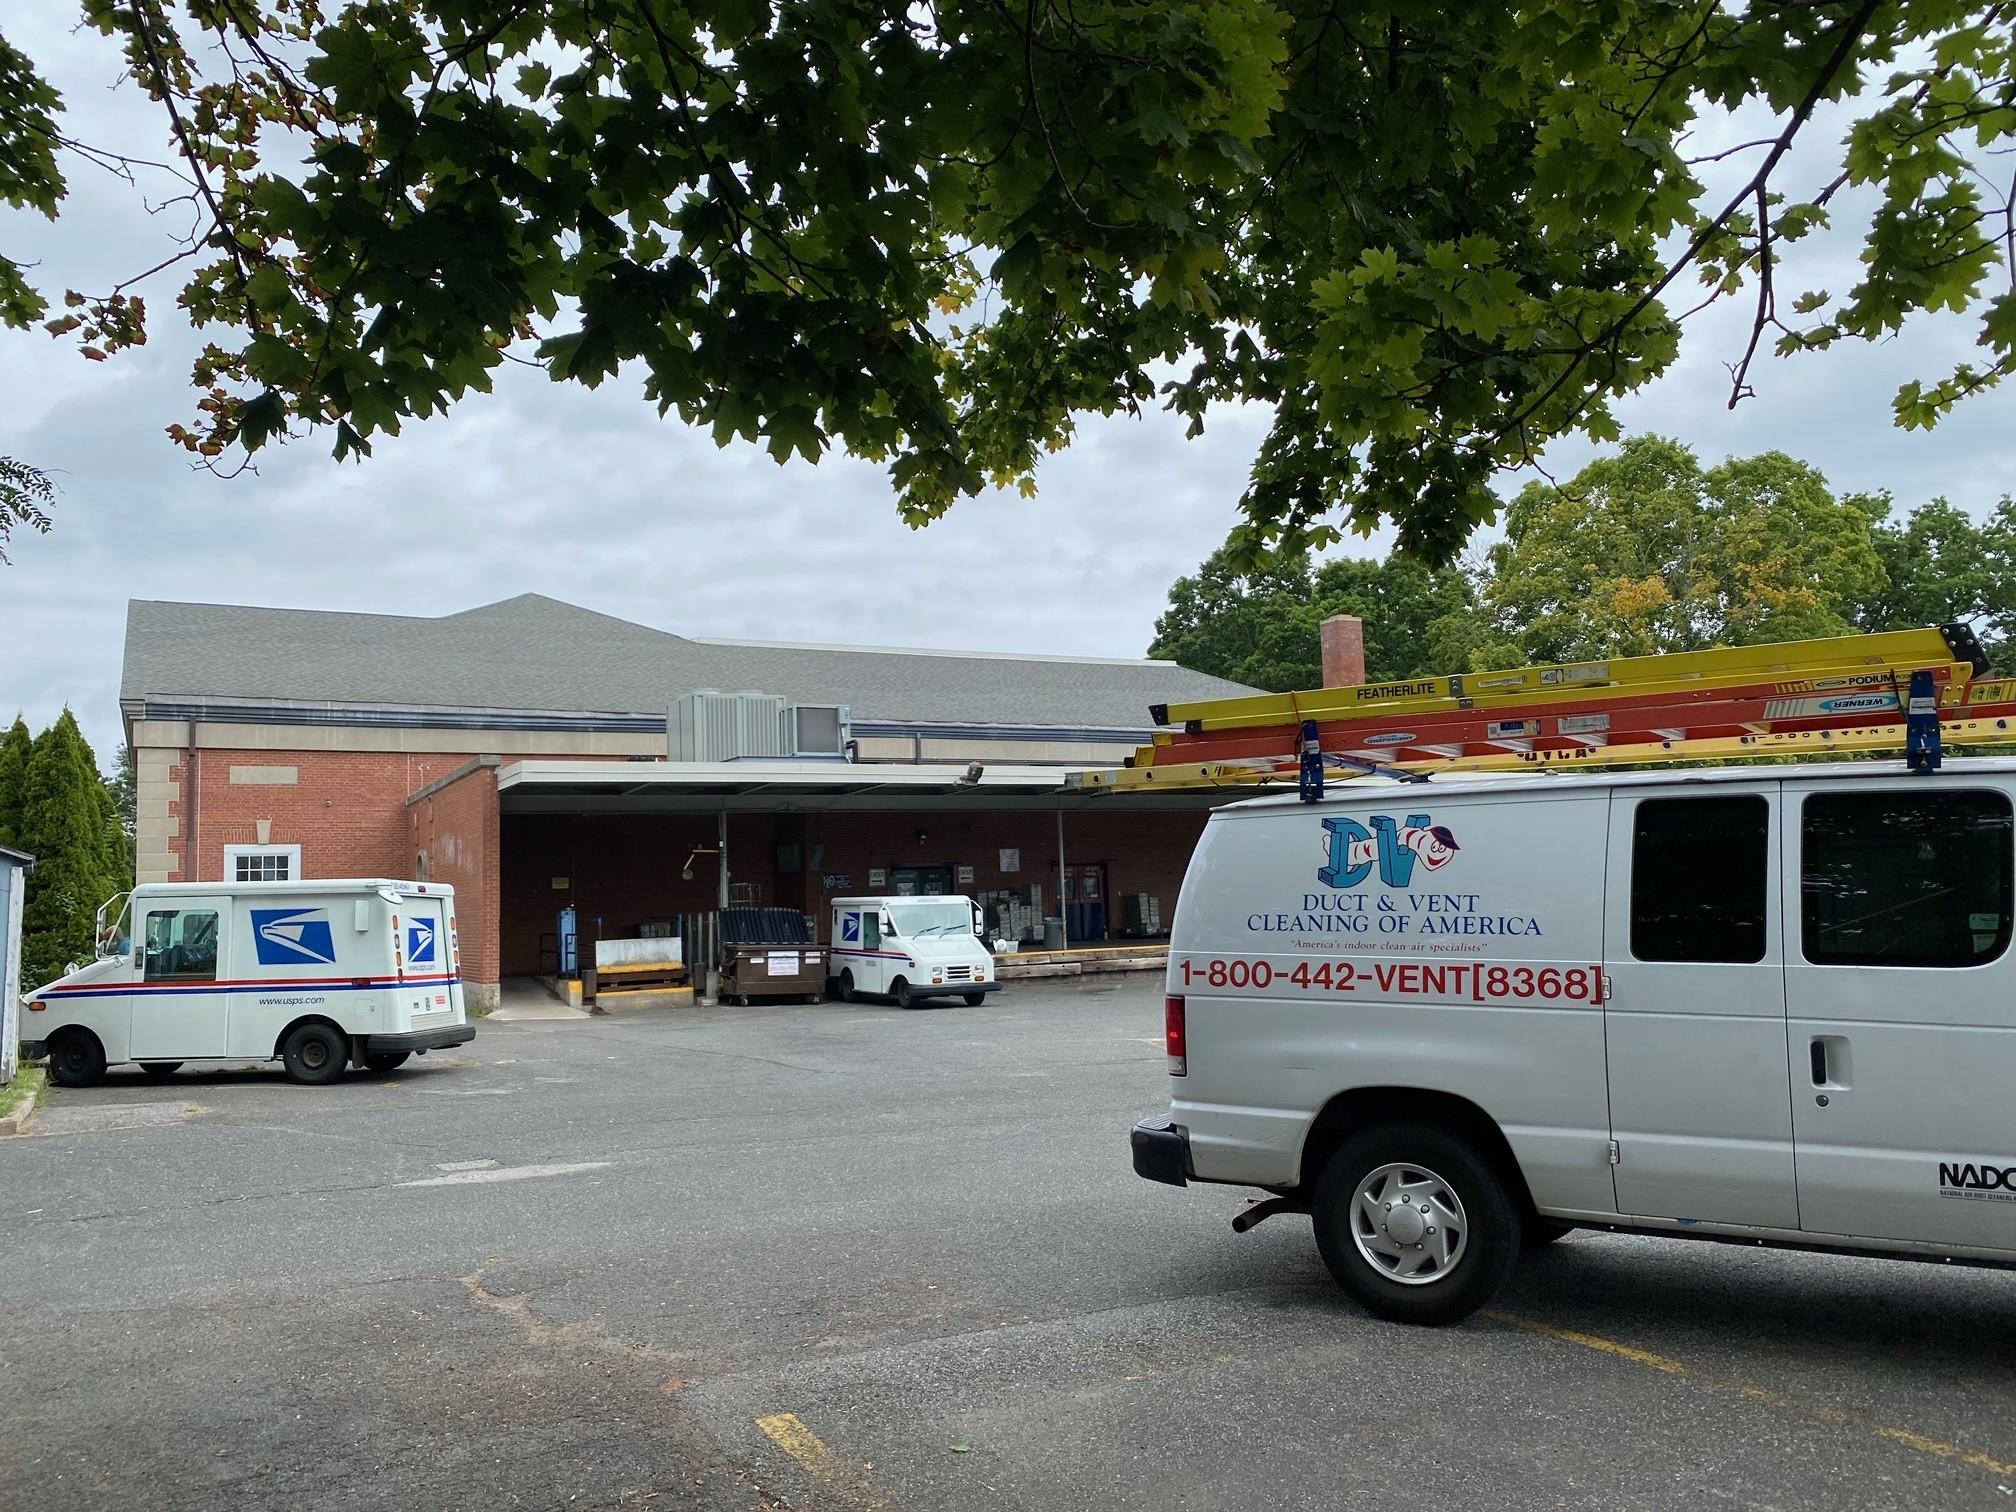 Stratford Post Office – Stratford, CT image002.jpg